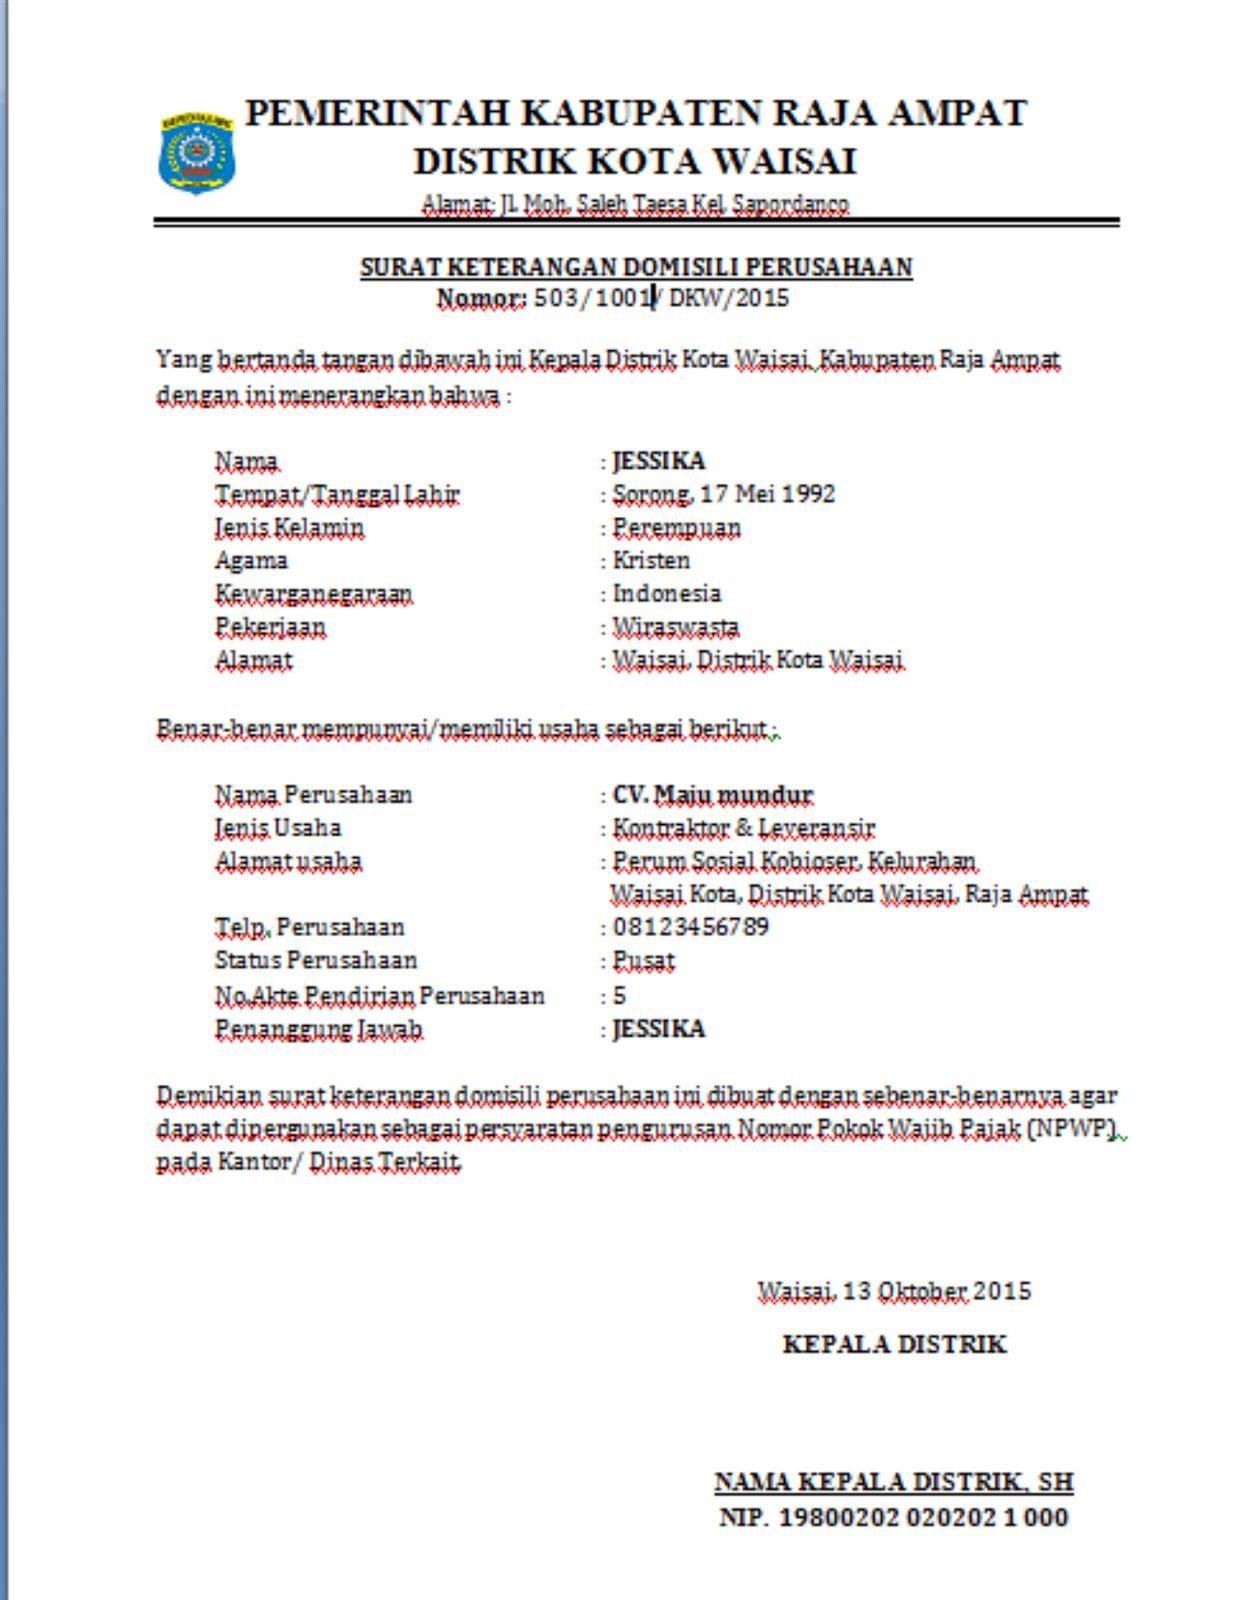 Contoh Surat Keterangan Domisili Perusahaan Distrik Kota